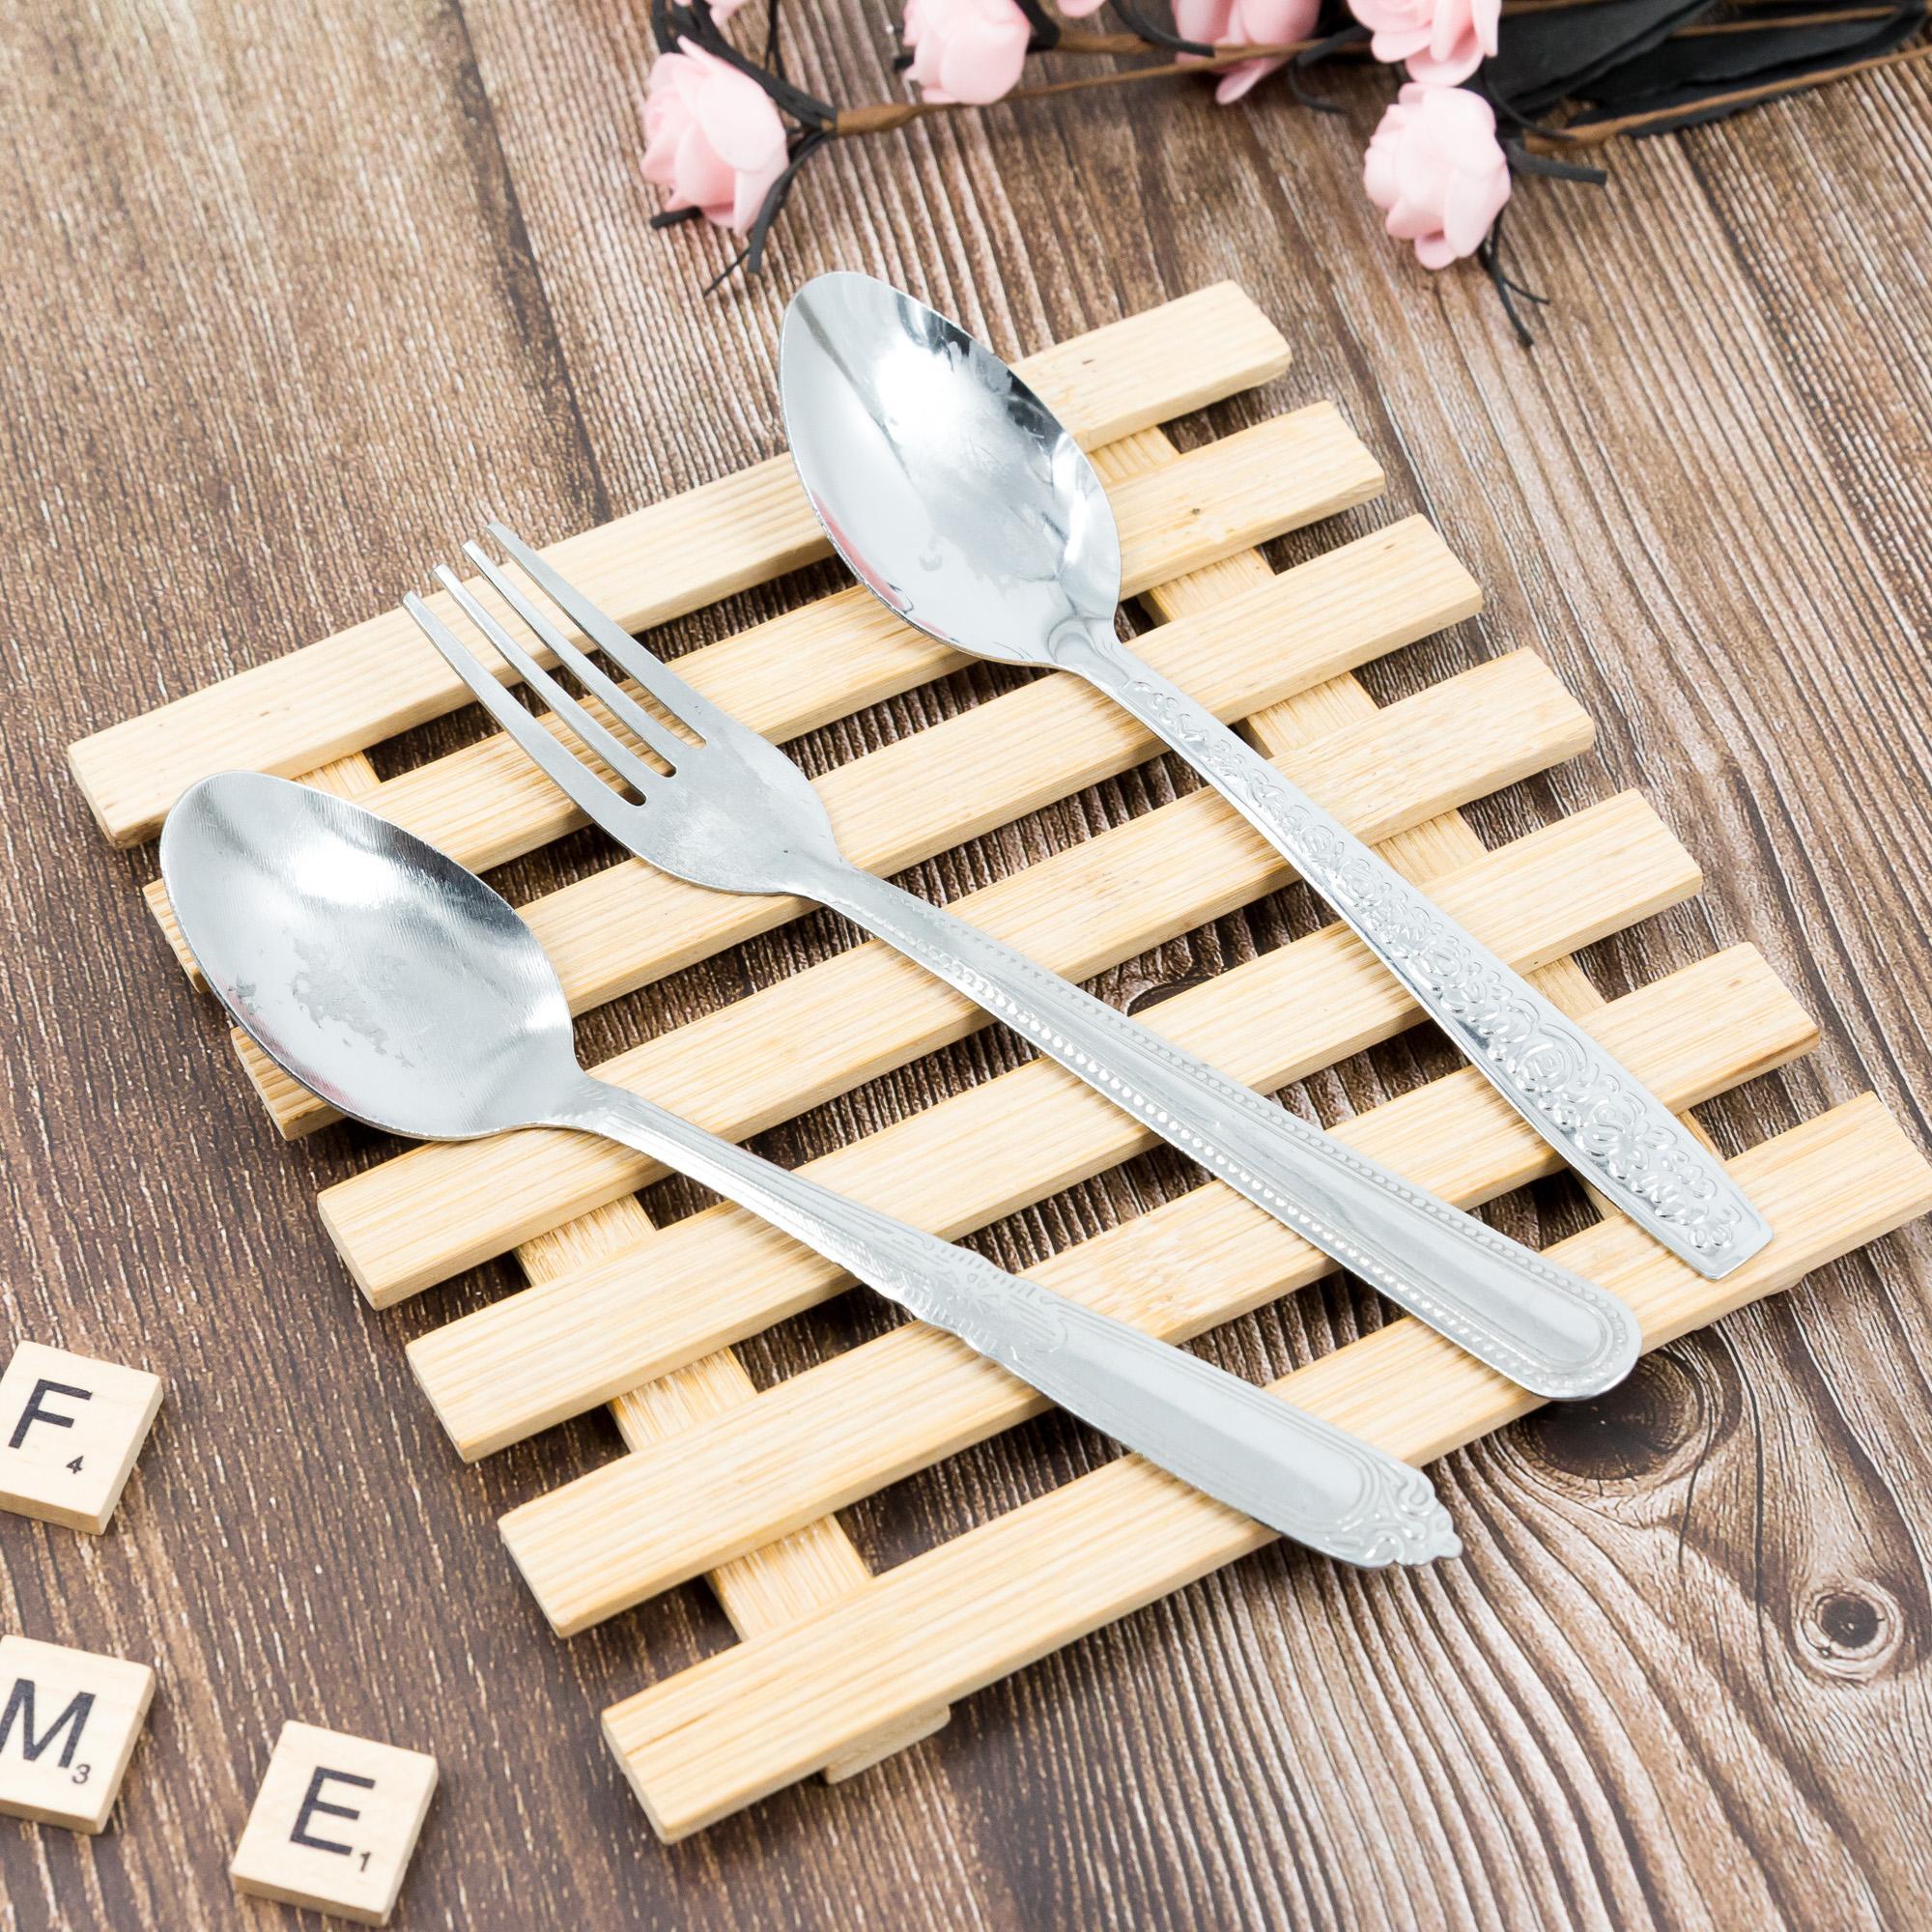 MFHome Stainless Steel Spoon/Fork